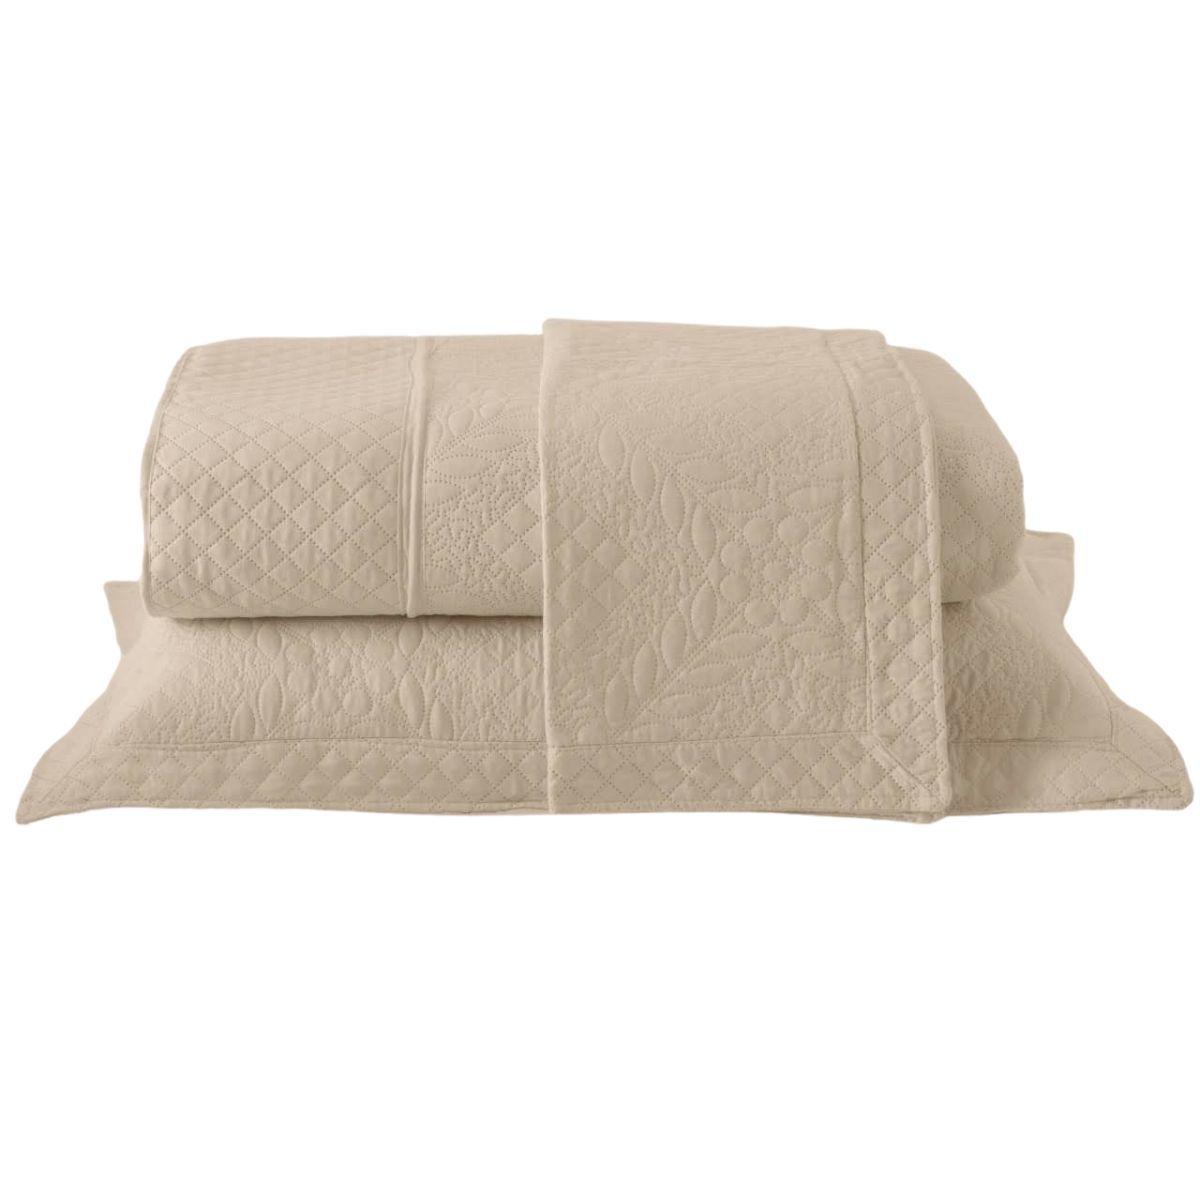 Kit: 1 Colcha Cobre-leito Provence King de Microfibra Ultrasonic + 2 Porta-travesseiros PALHA